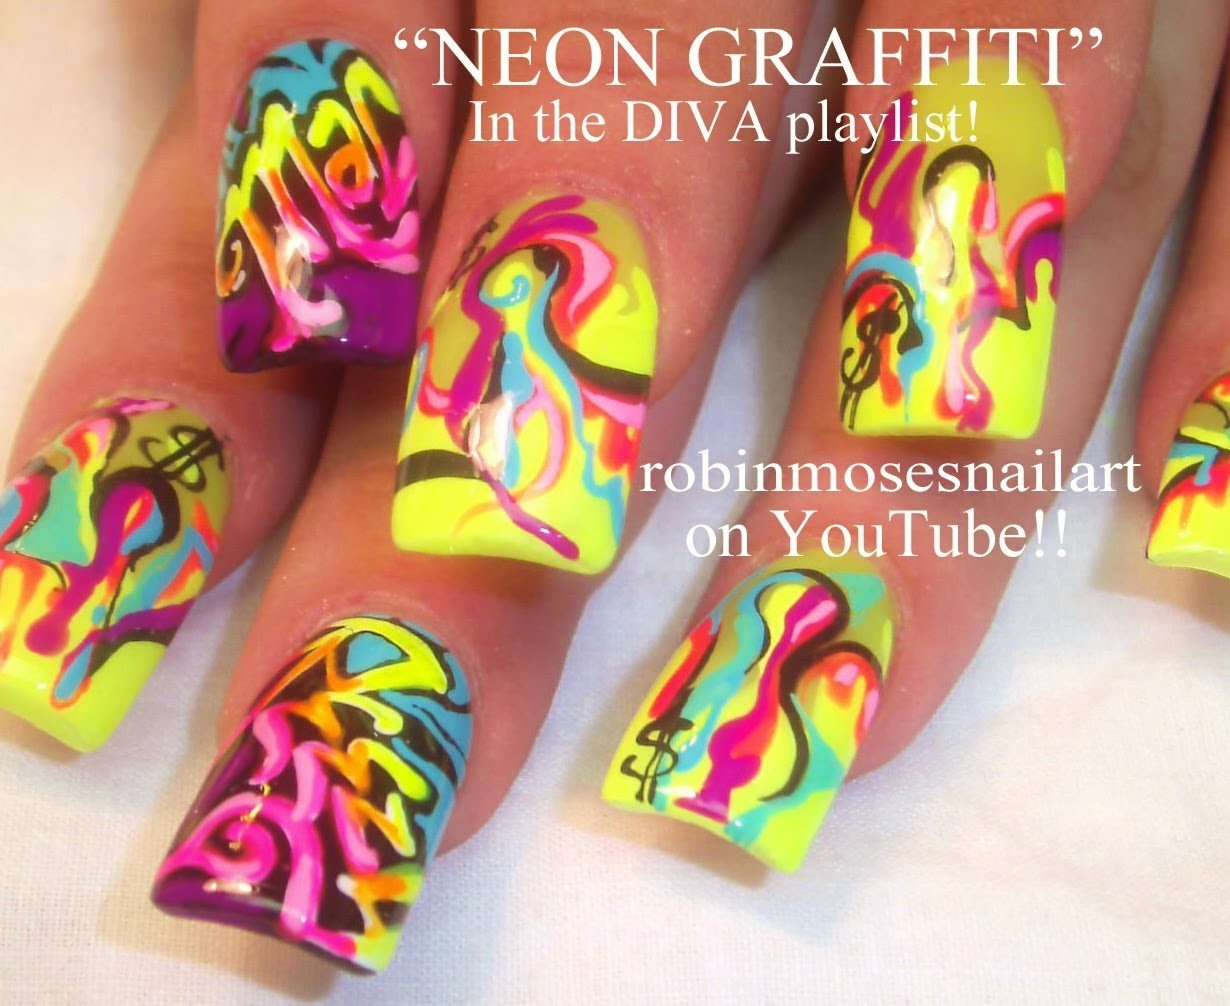 Neon Graffiti Nail Art Design Tutorial